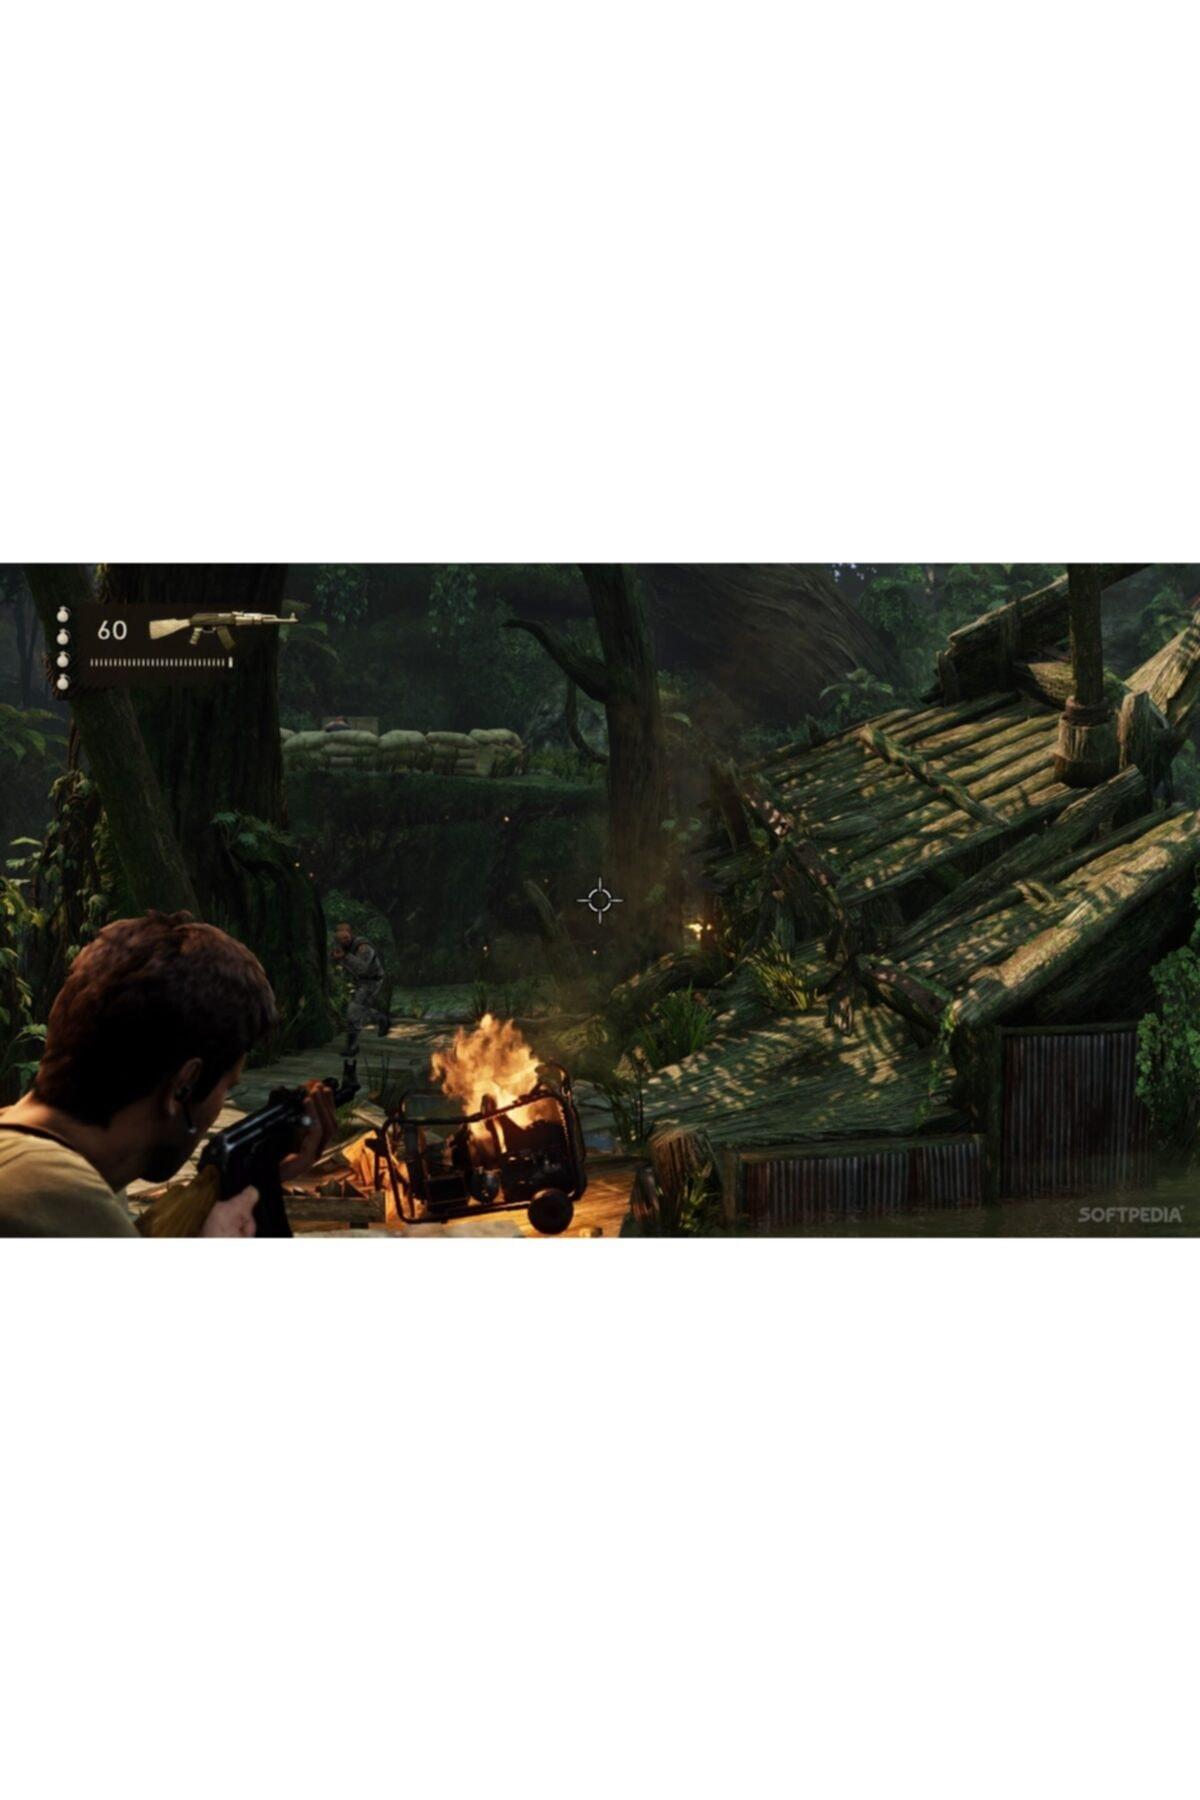 Naughty Dog Ps4 Uncharted Collection- Orjinal Oyun - Sıfır Jelatin 2